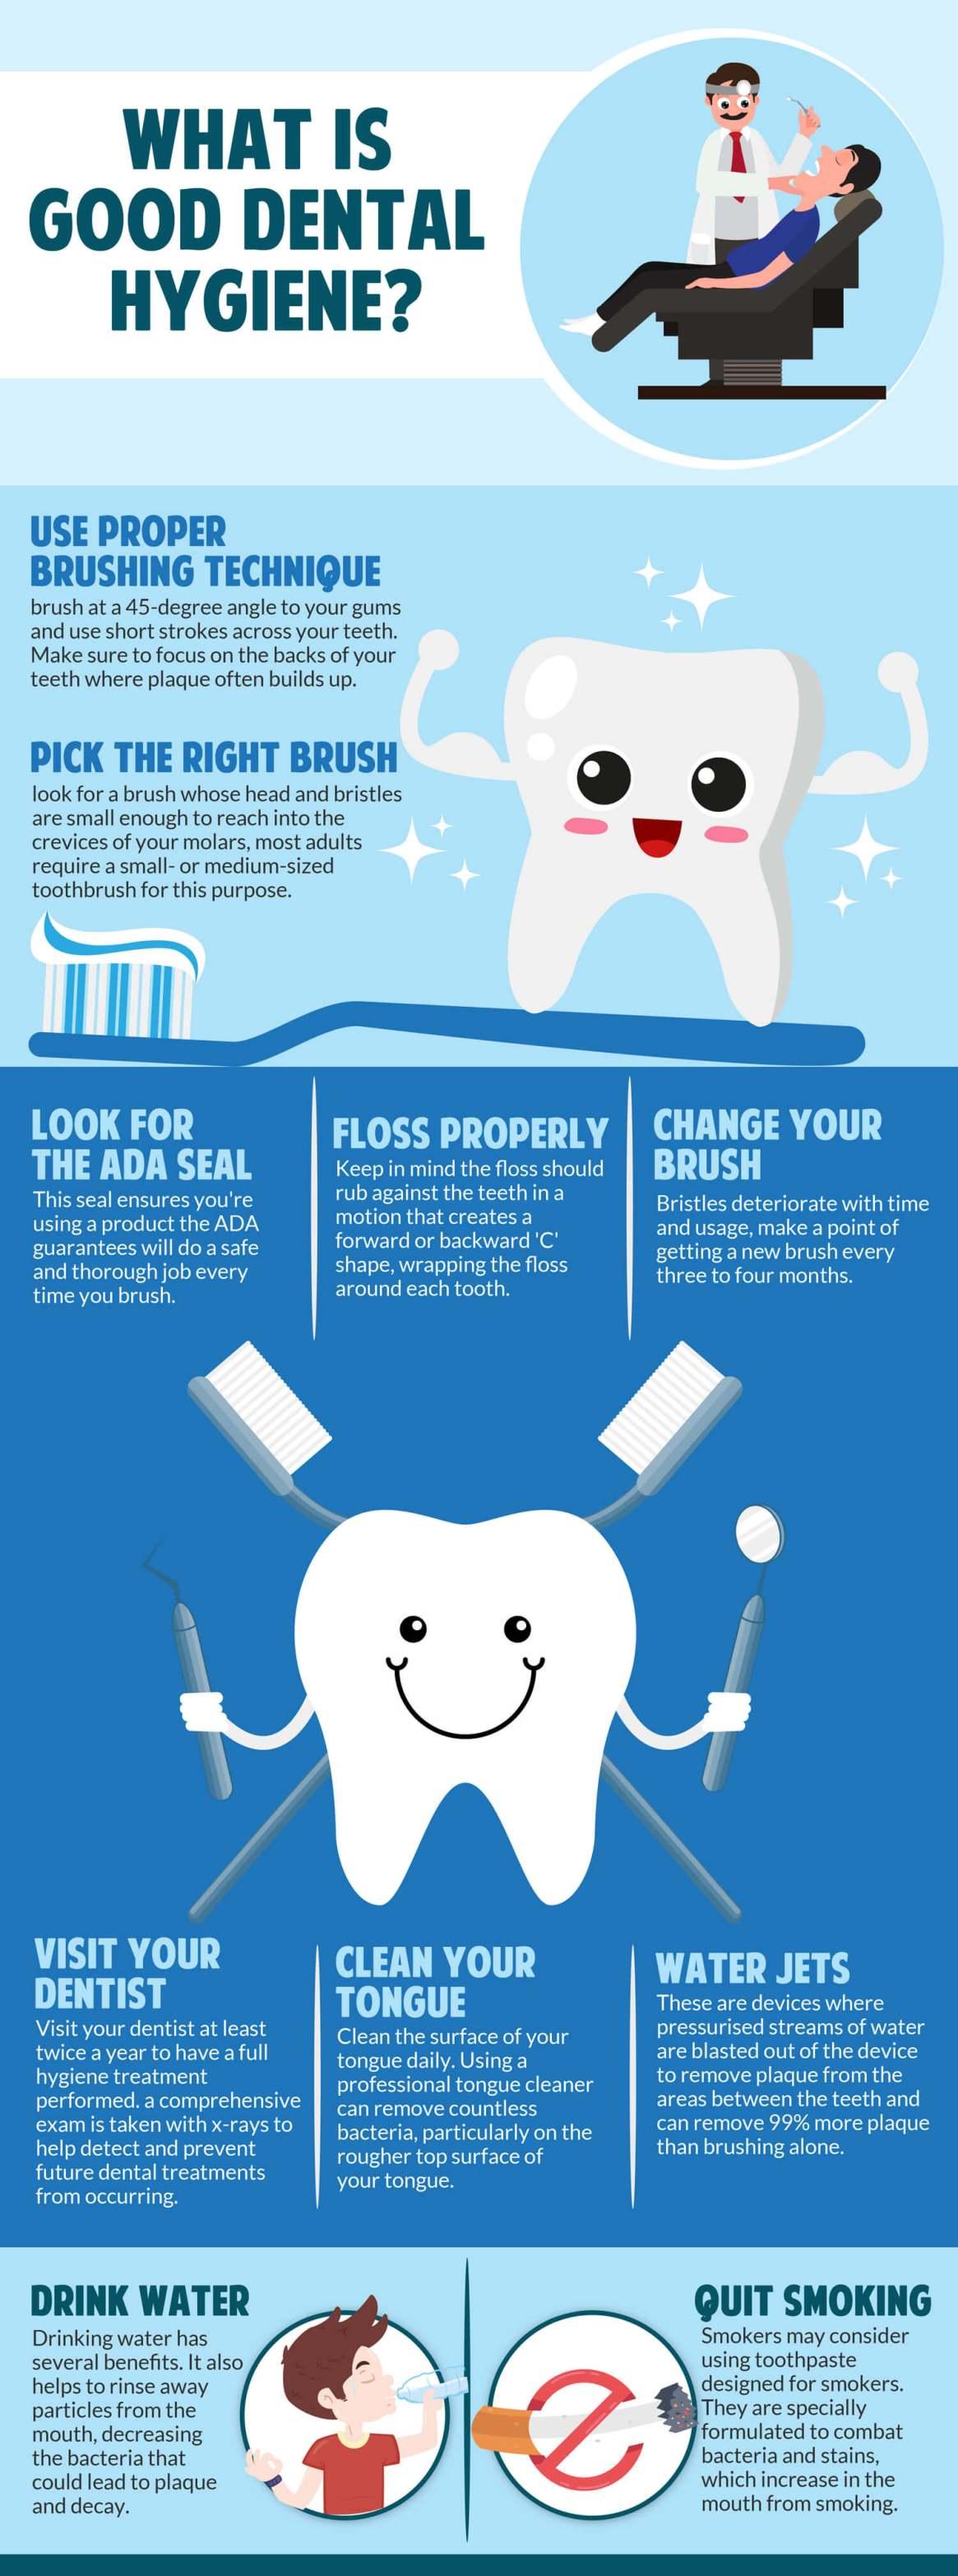 Practical Dental Hygiene Tips from a Calgary Dentist